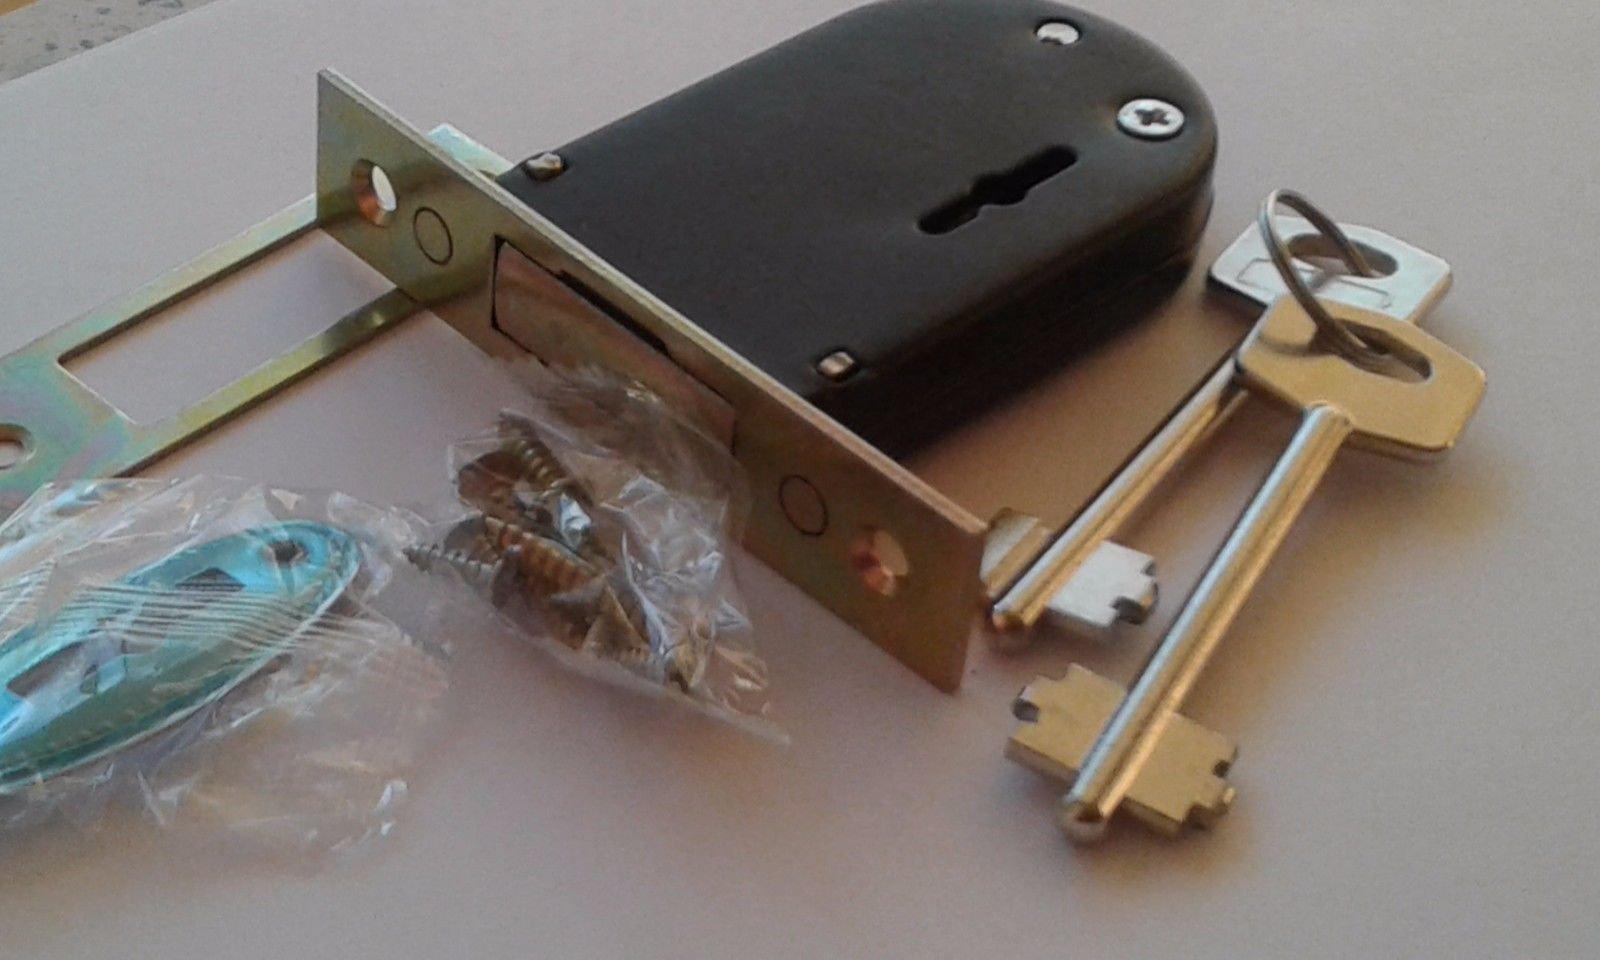 Door Lock/ Deadbolt / With Double Bitted Keys/With 2 Keys